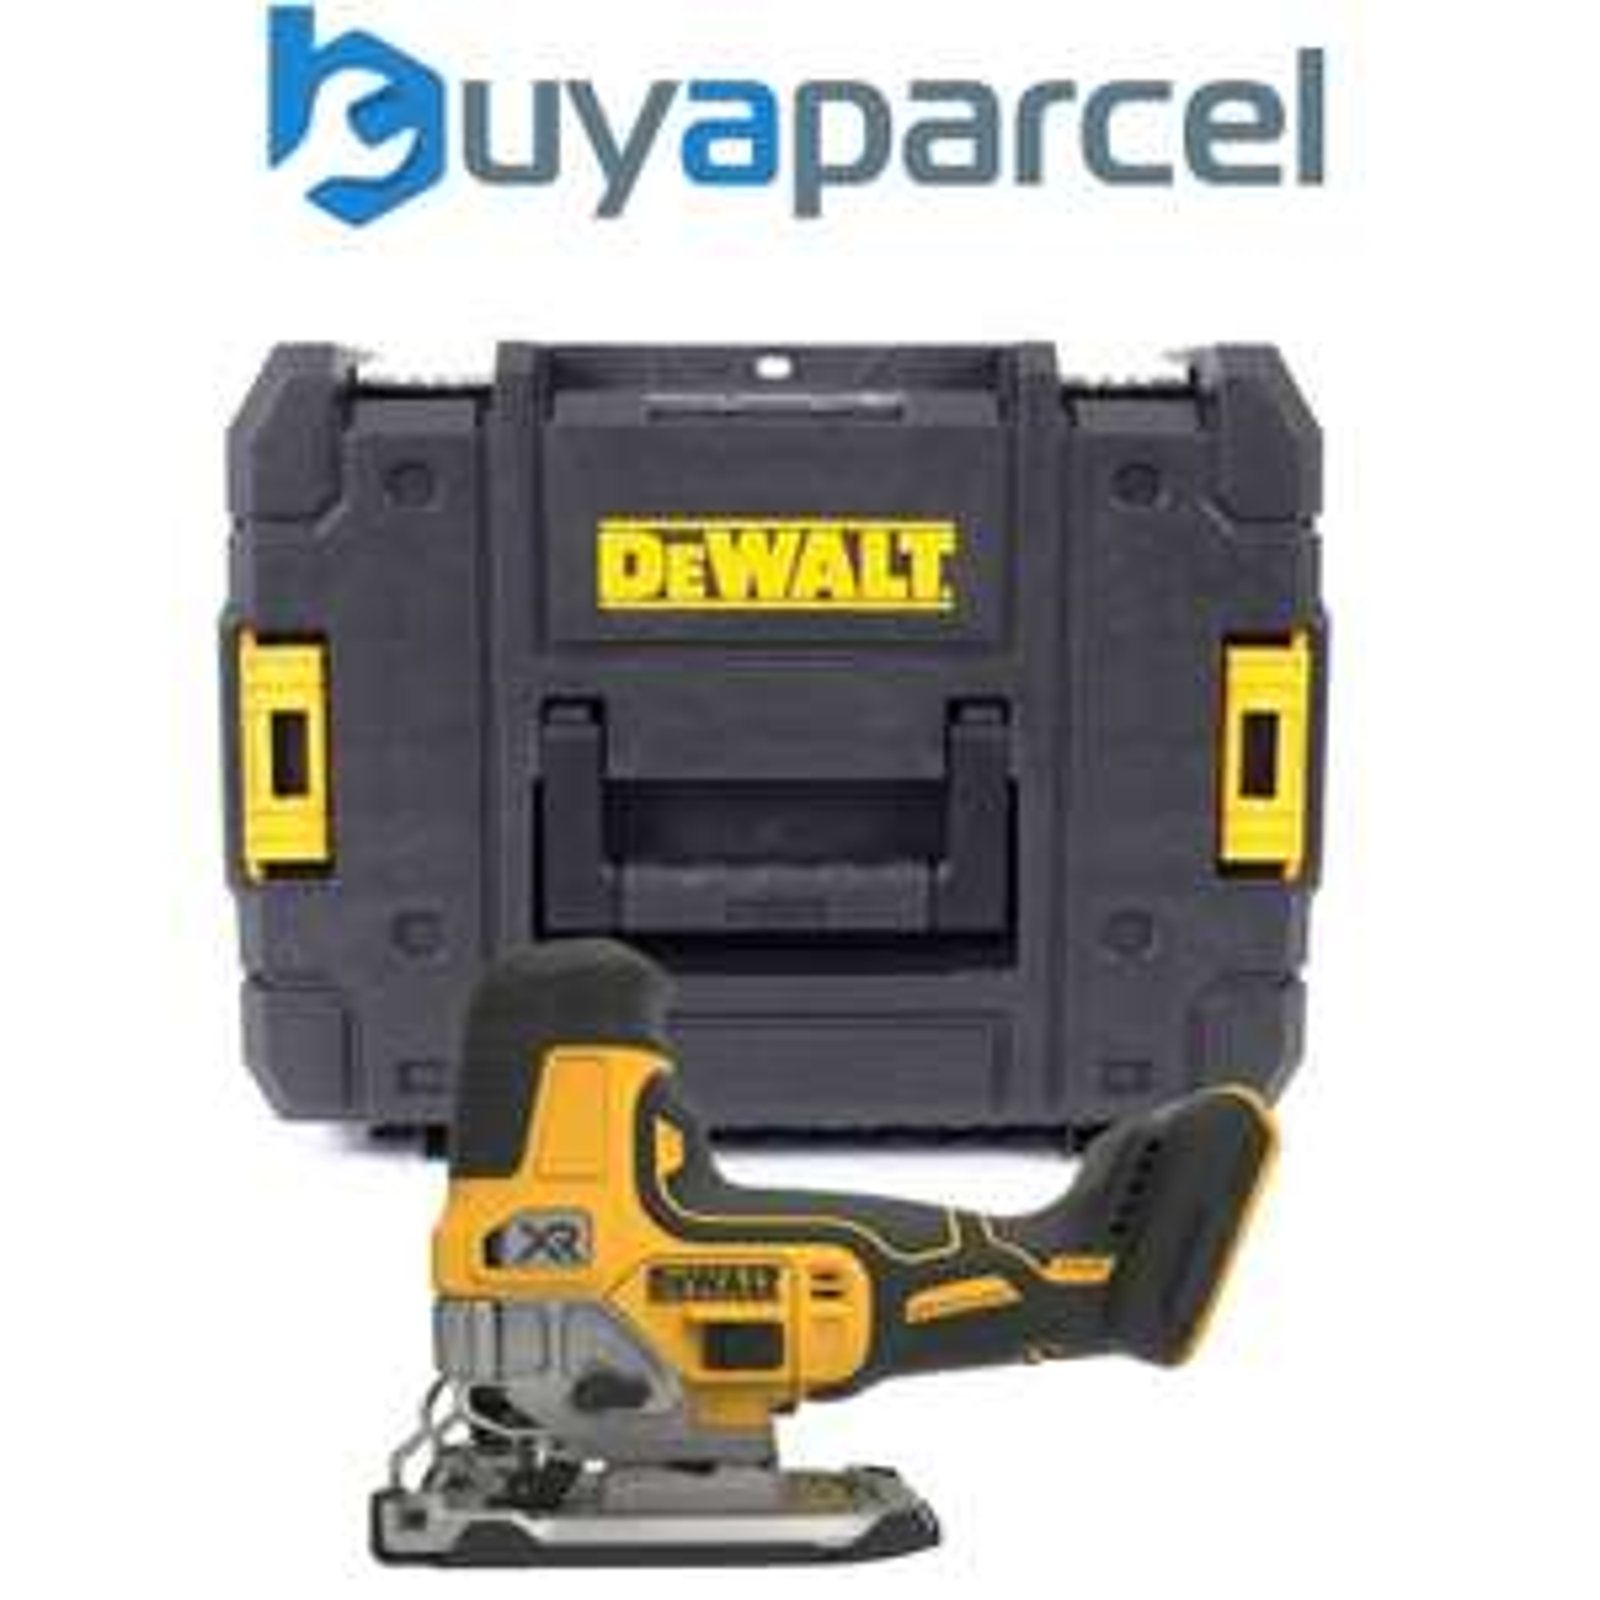 DeWalt DCS335N 18v XR Cordless Brushless Body Grip Jigsaw Bare Unit & TSTAK Case £175.99 @ Ebay buyaparcel